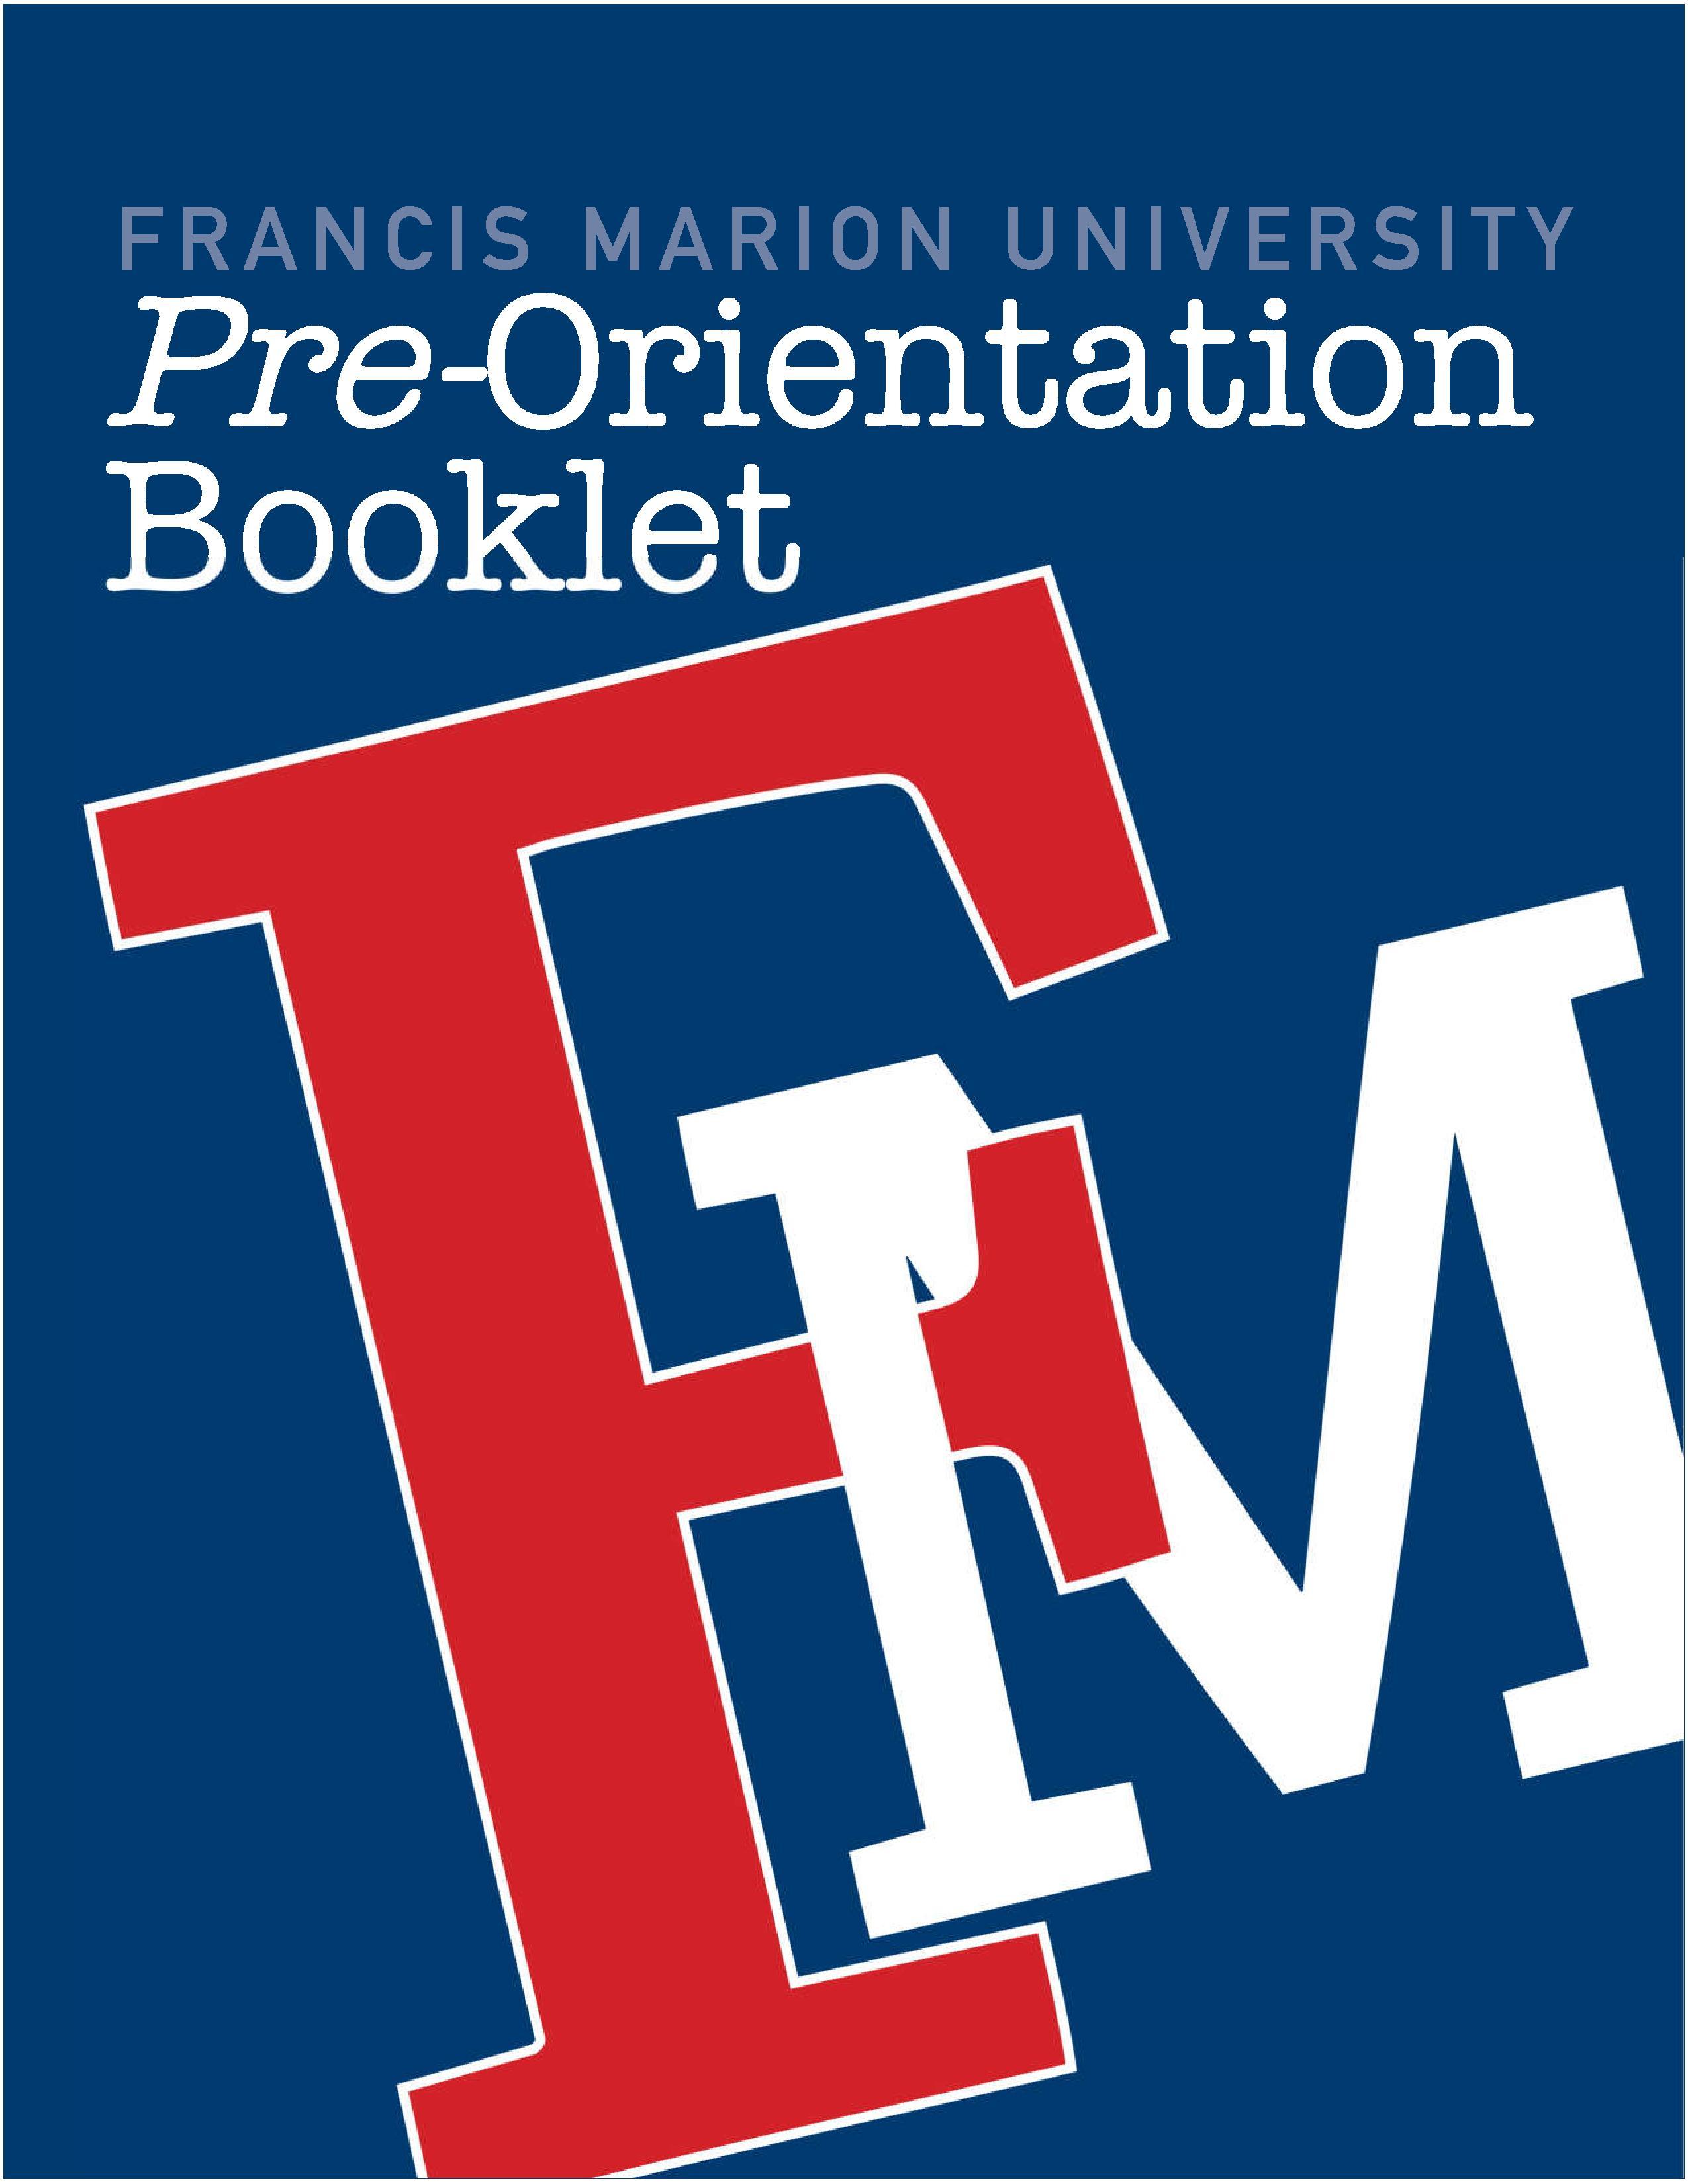 FMU Pre-Orientation Booklet cover